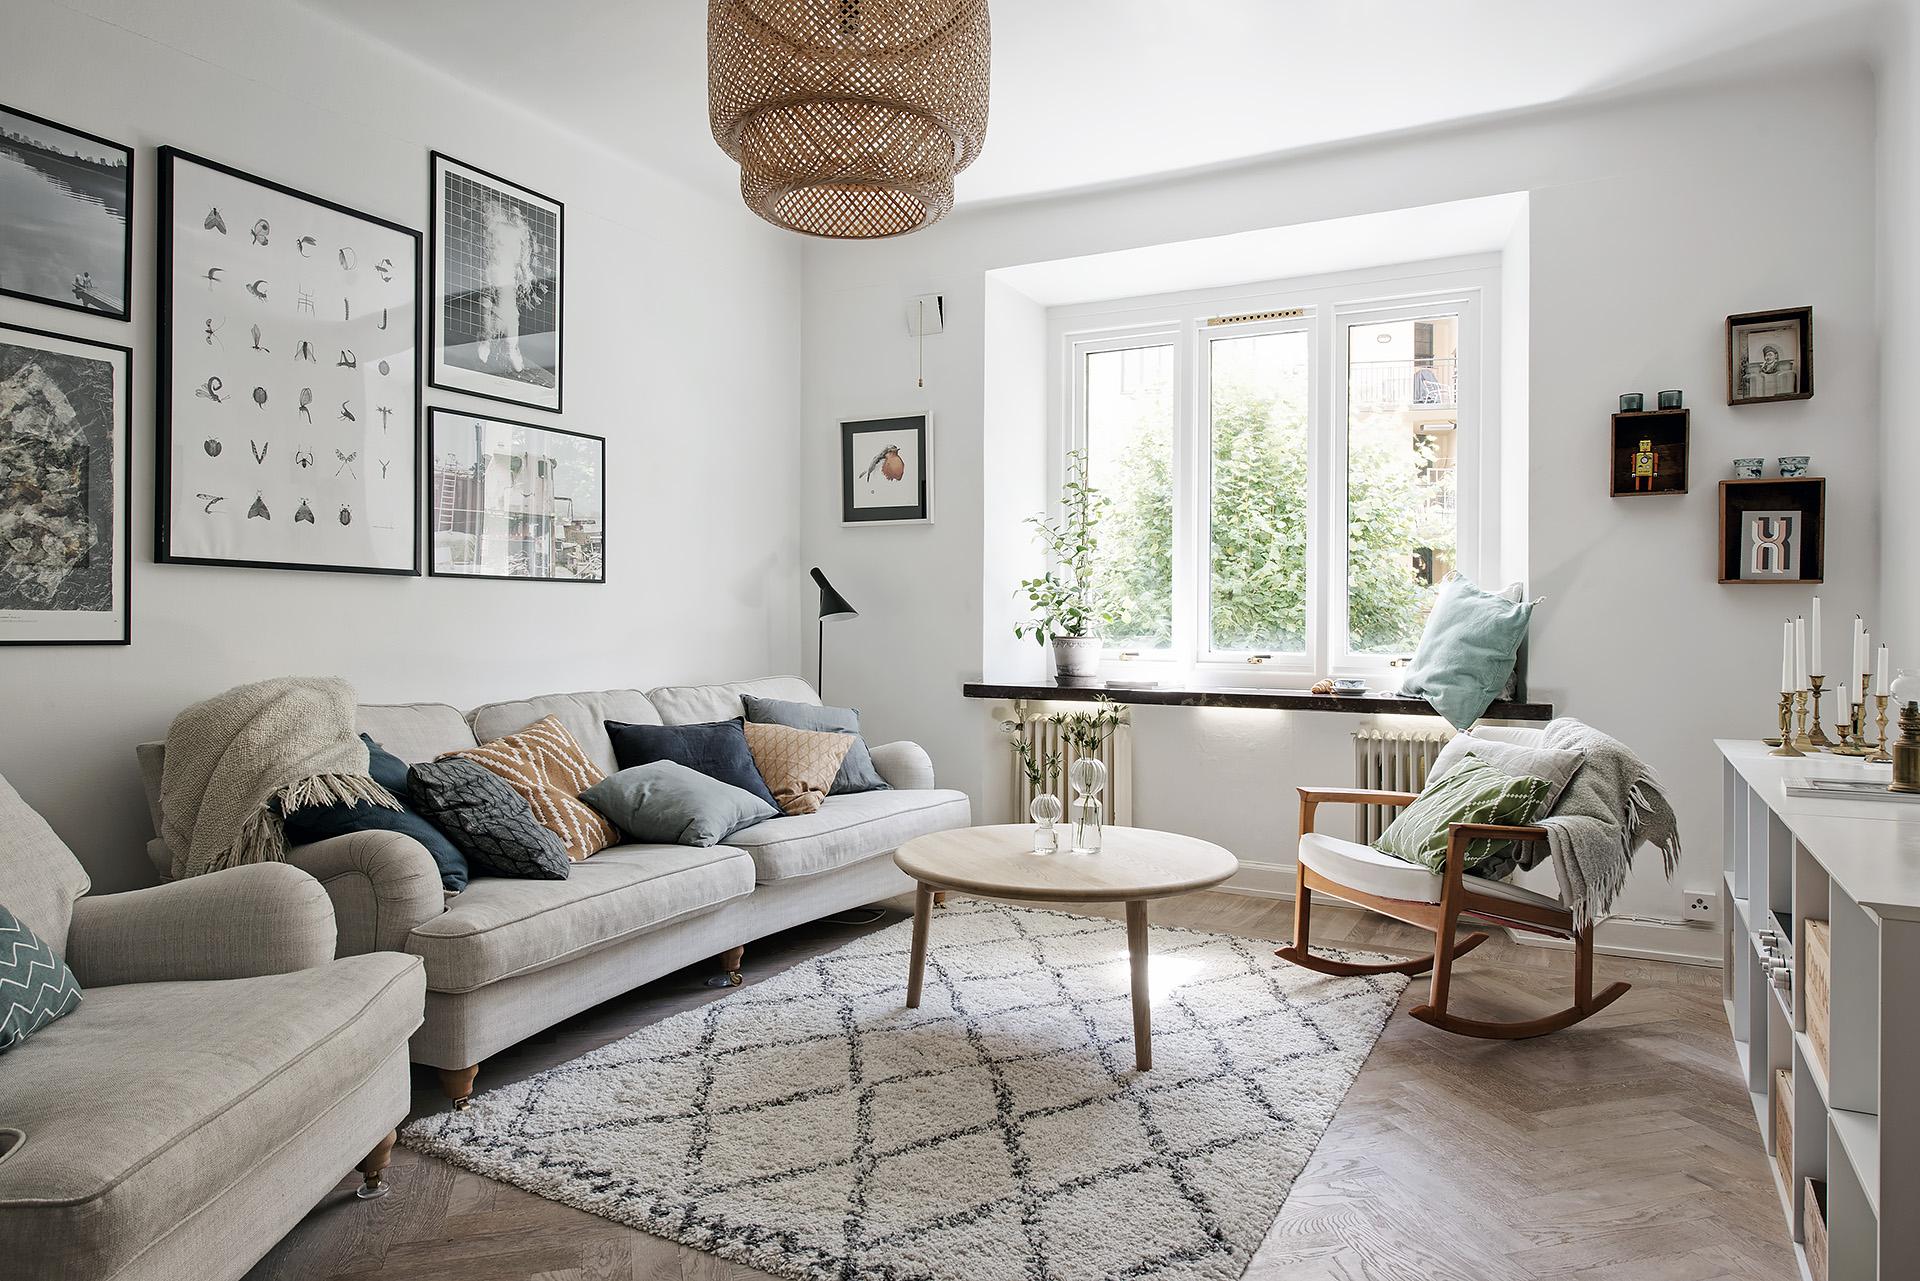 New Dreamy Ikea Bathroom Daily Dream Decor: A Dreamy & Cozy Scandinavian Apartment